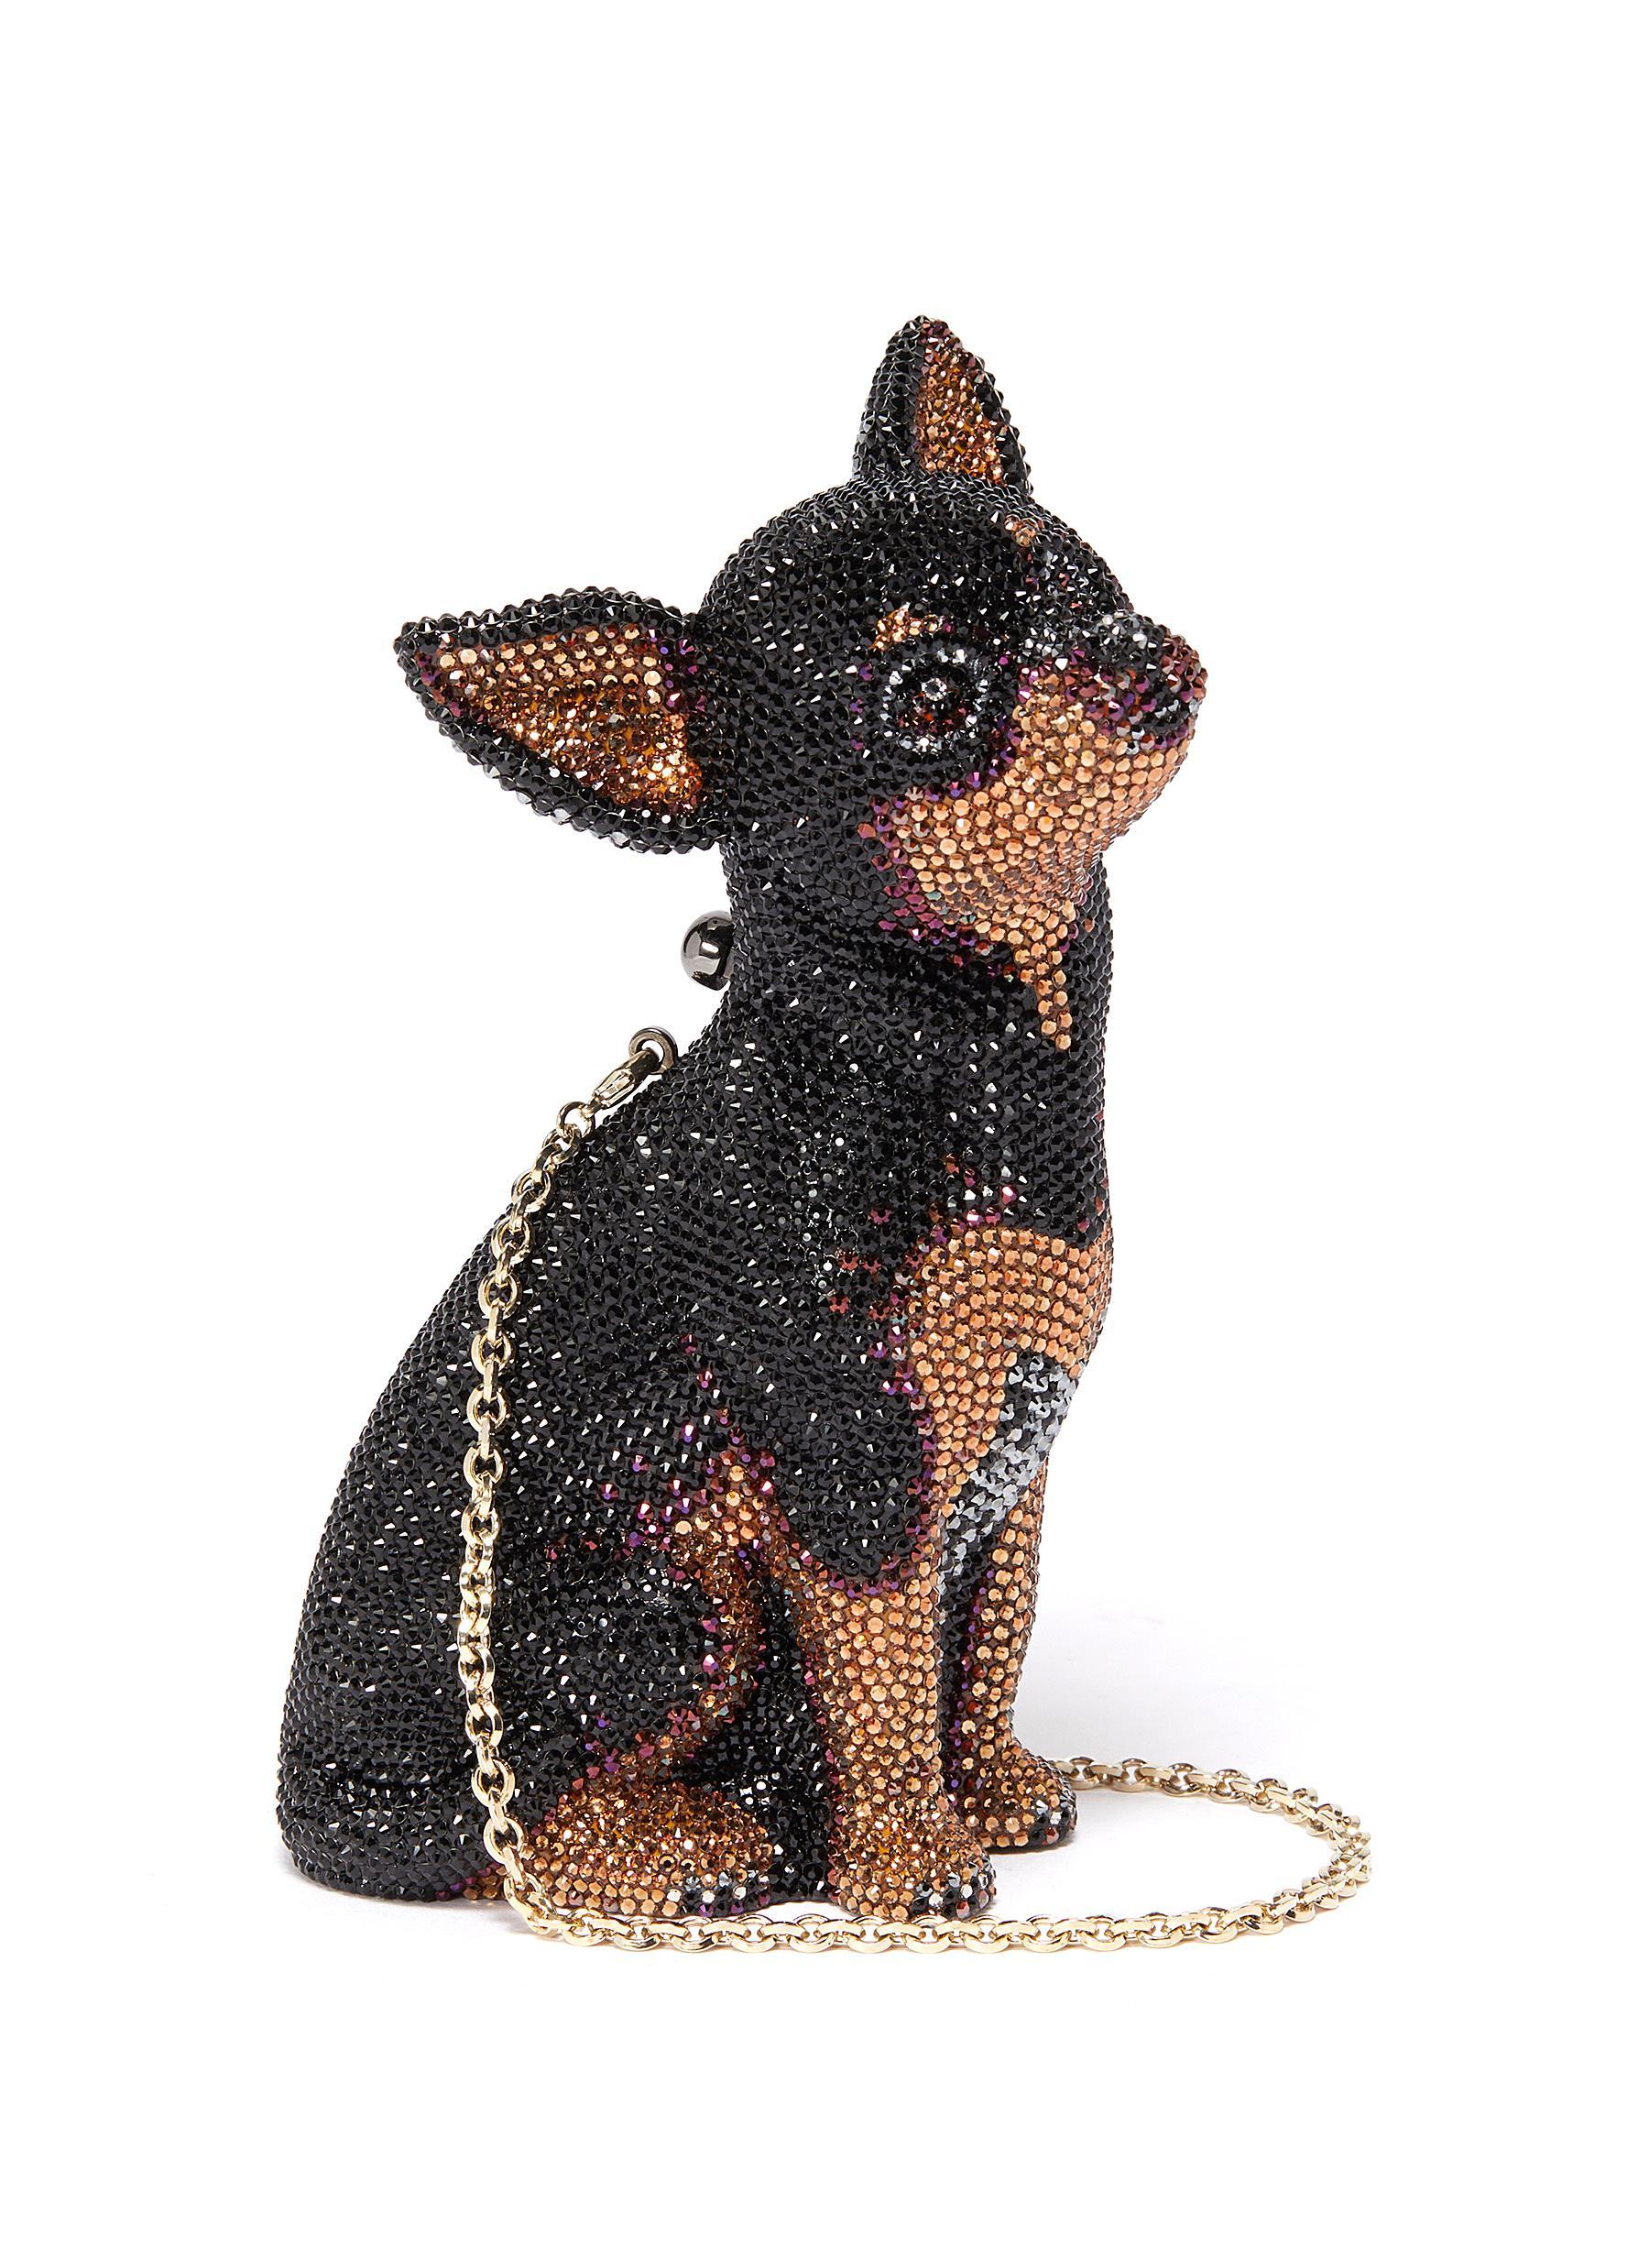 'Mickie Chihuahua' glass crystal pavé minaudière